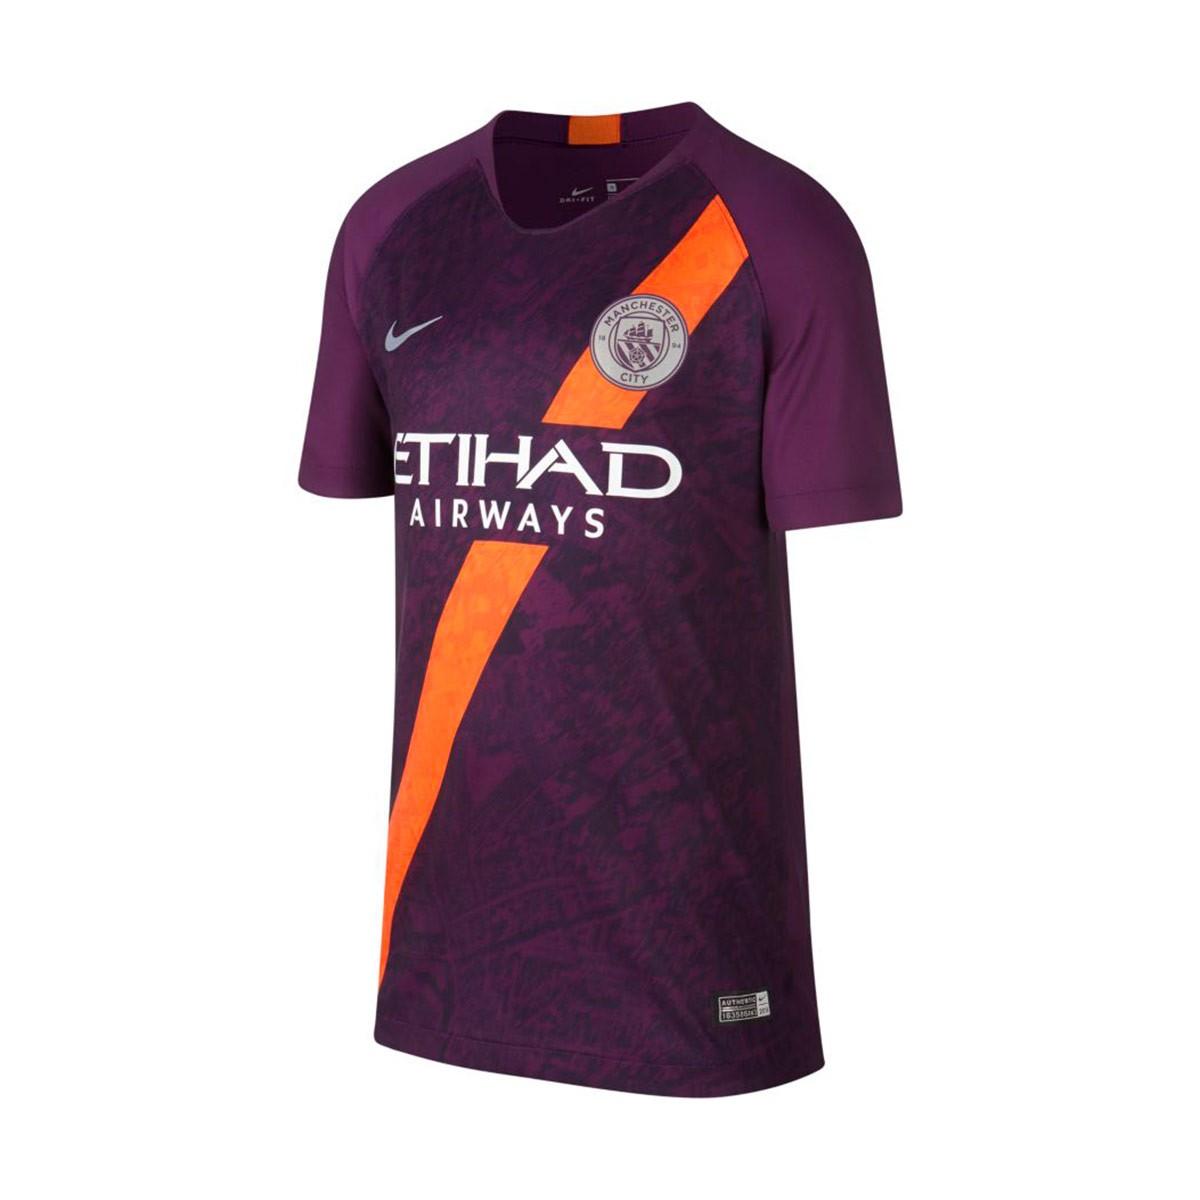 784cc0e6ed889 Jersey Nike Kids Manchester City FC Stadium 2018-2019 Third Night purple -  Tienda de fútbol Fútbol Emotion